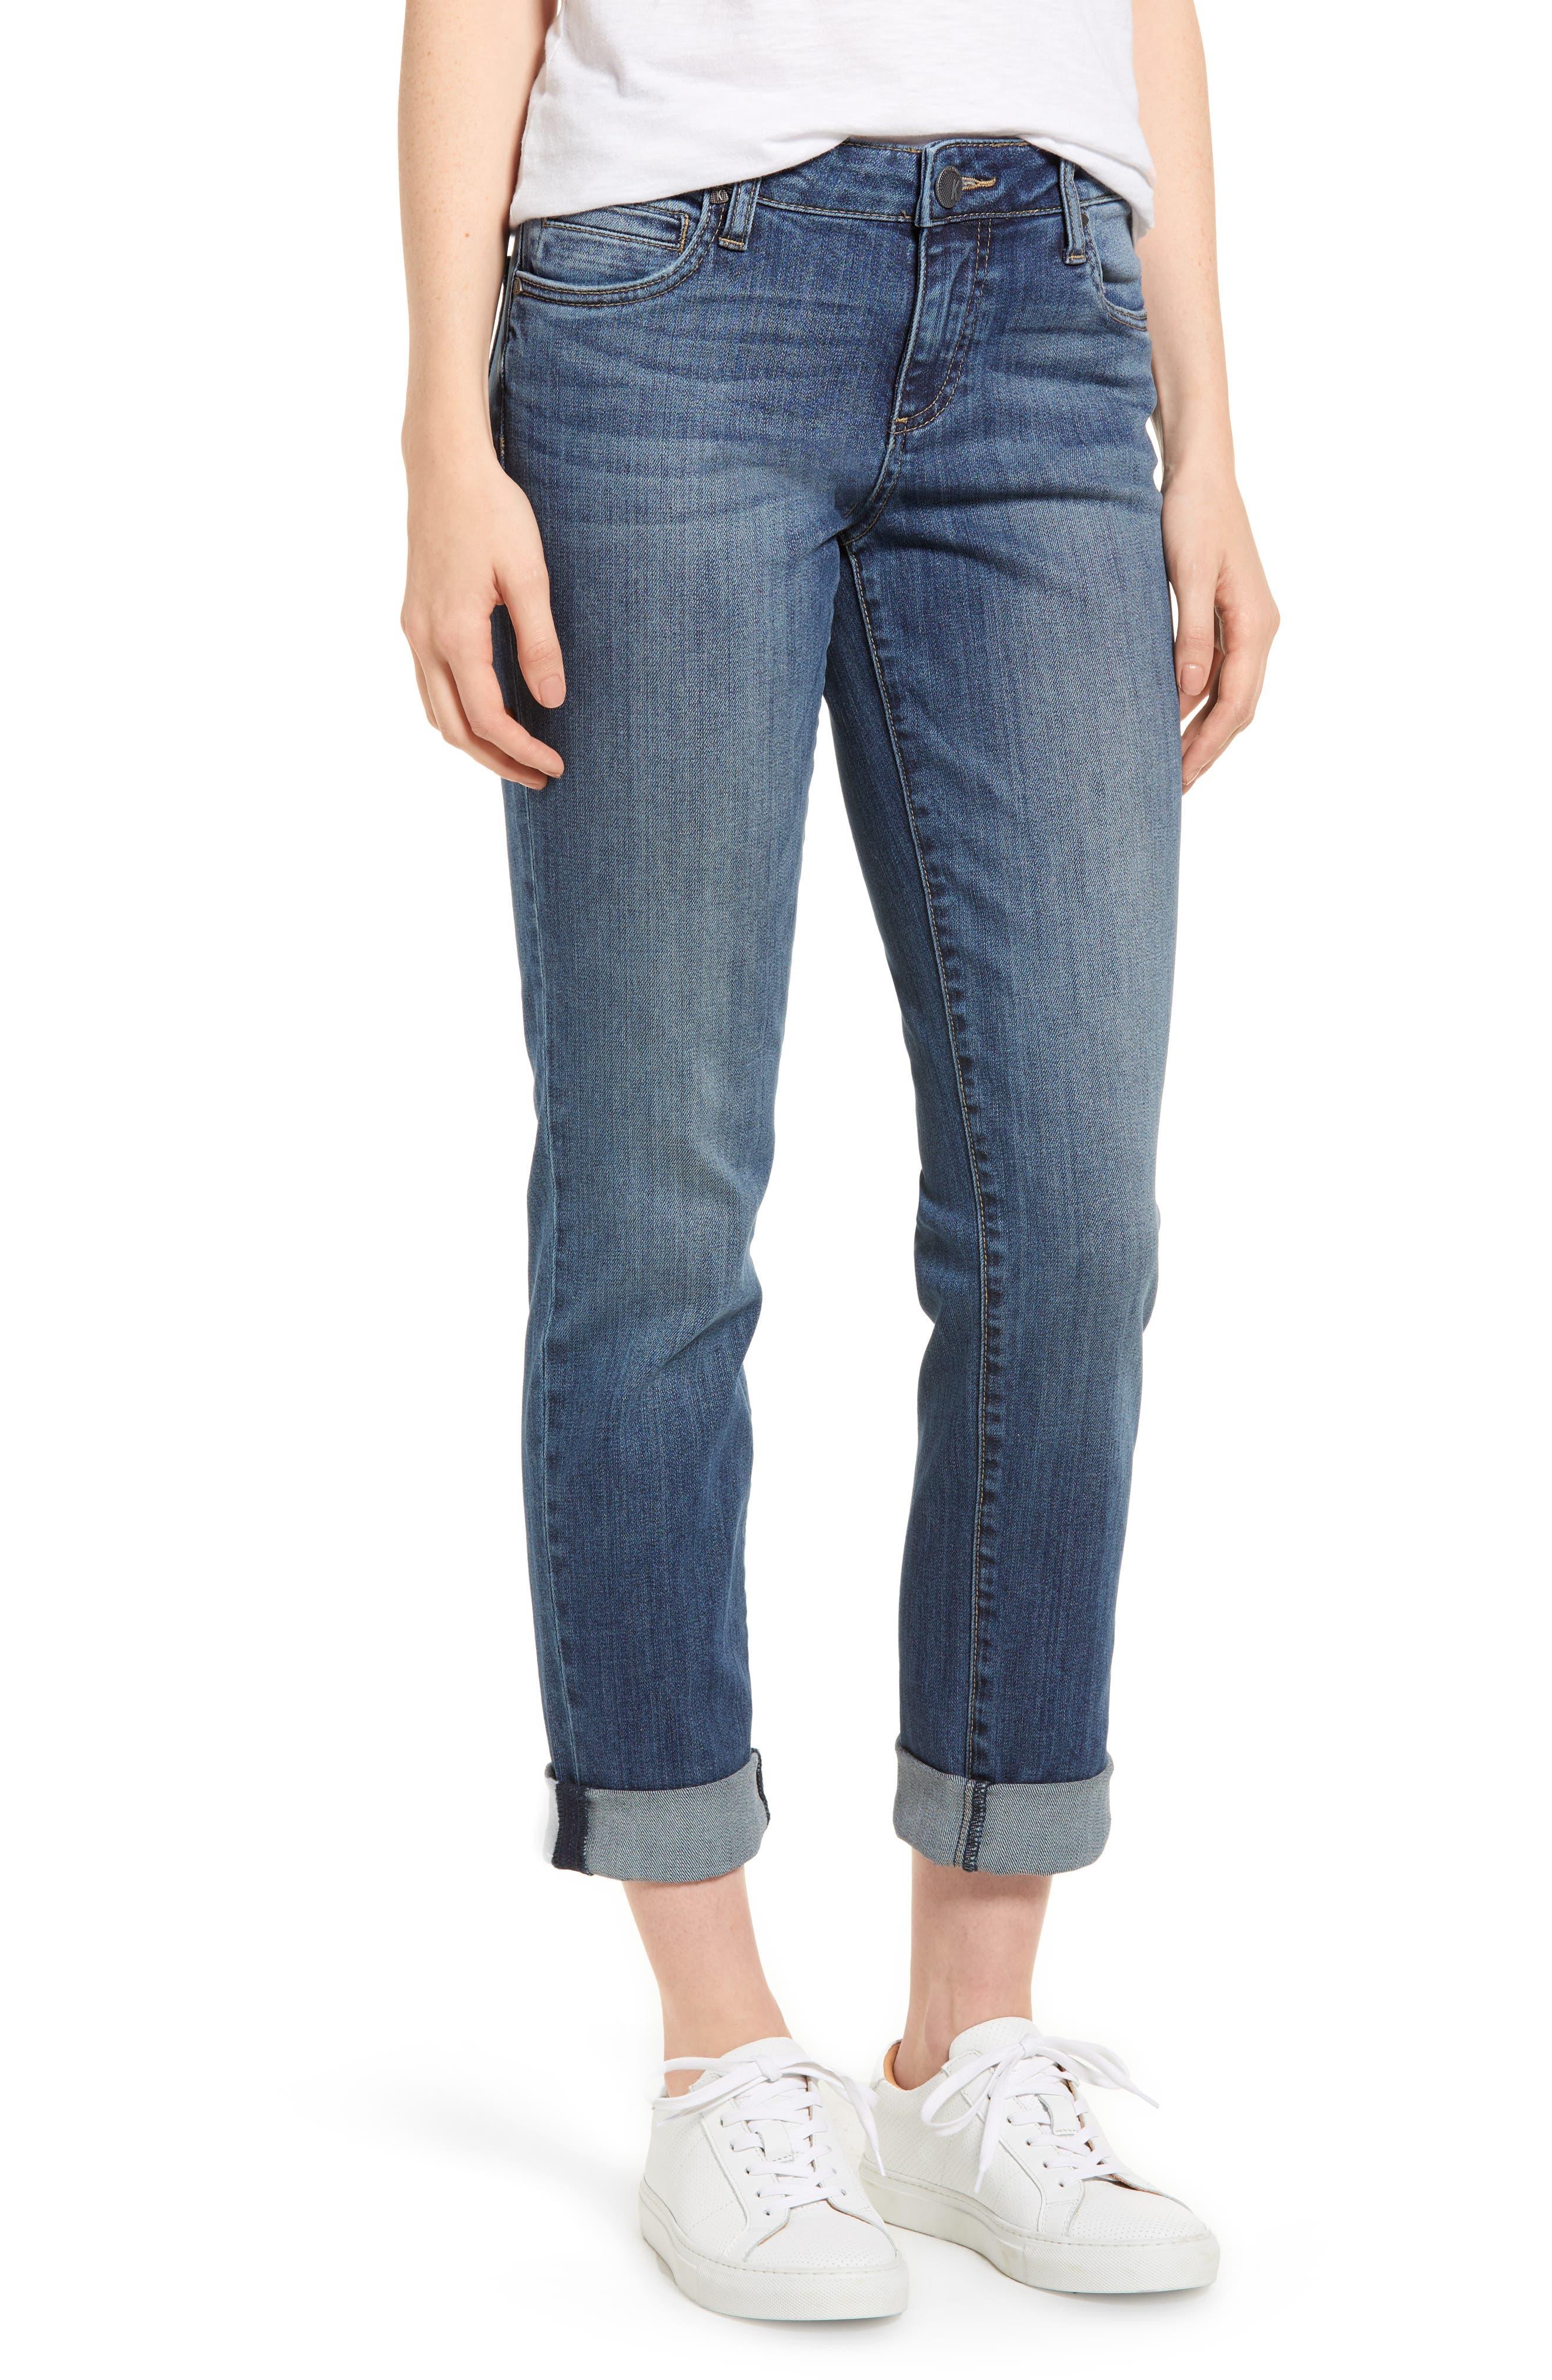 Catherine Boyfriend Jeans,                         Main,                         color, Improvise